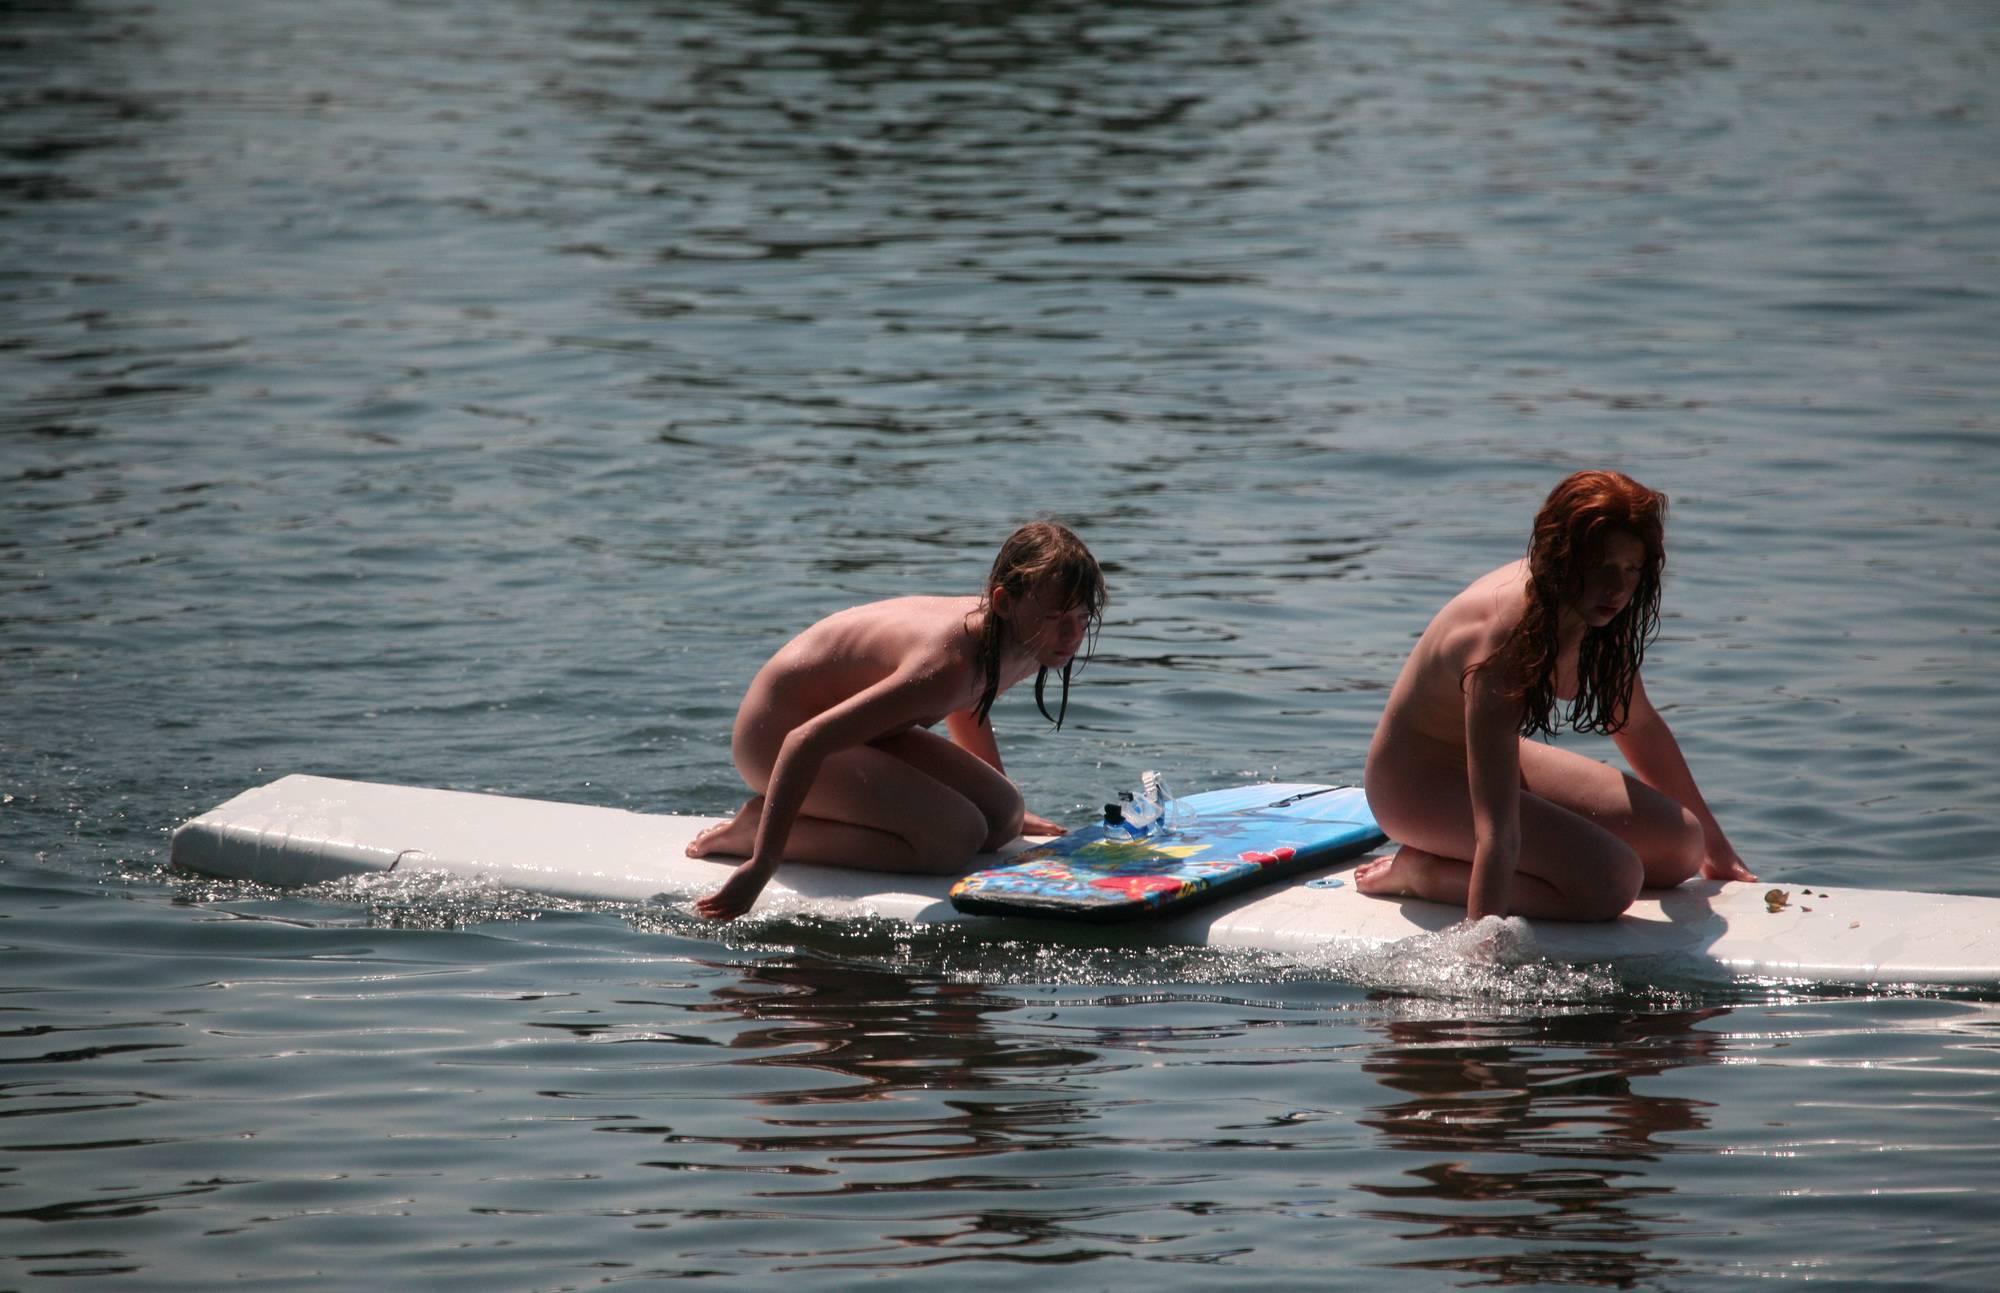 Pure Nudism Nudist Park Canoe Waters - 4